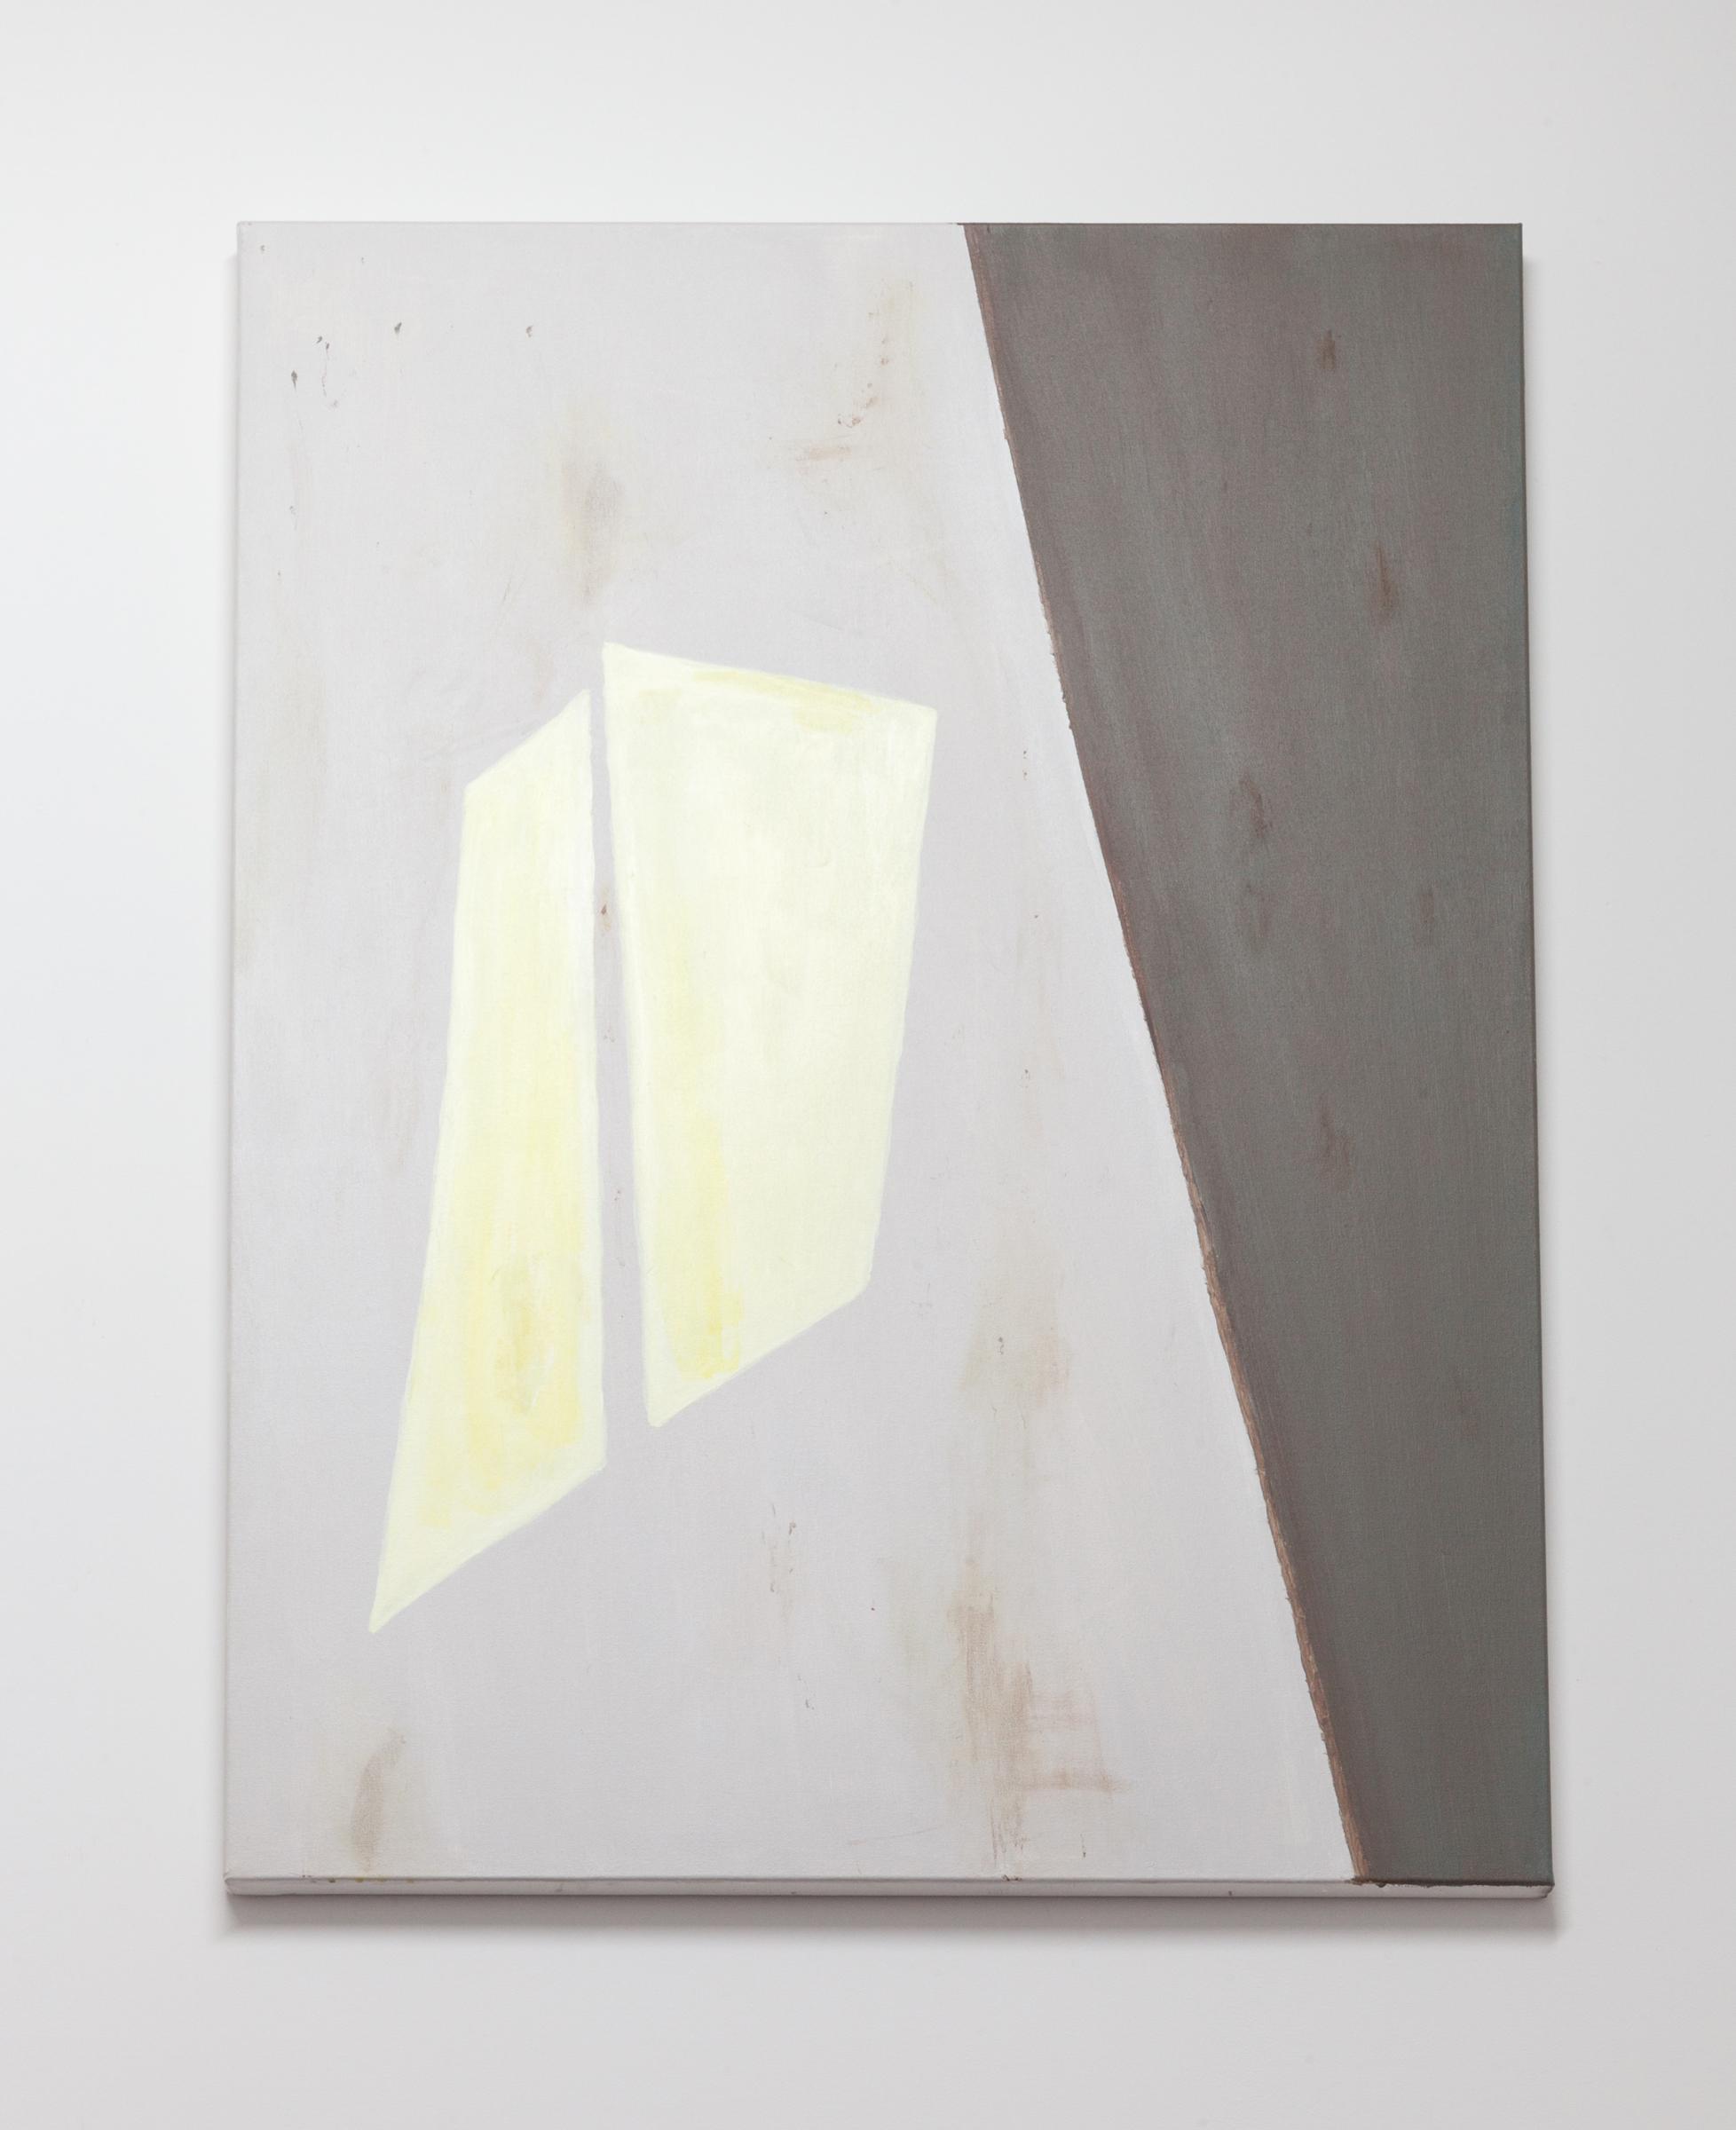 Jocko Weyland, Stairwell , 2014,acrylic on canvas,48 x 36 in